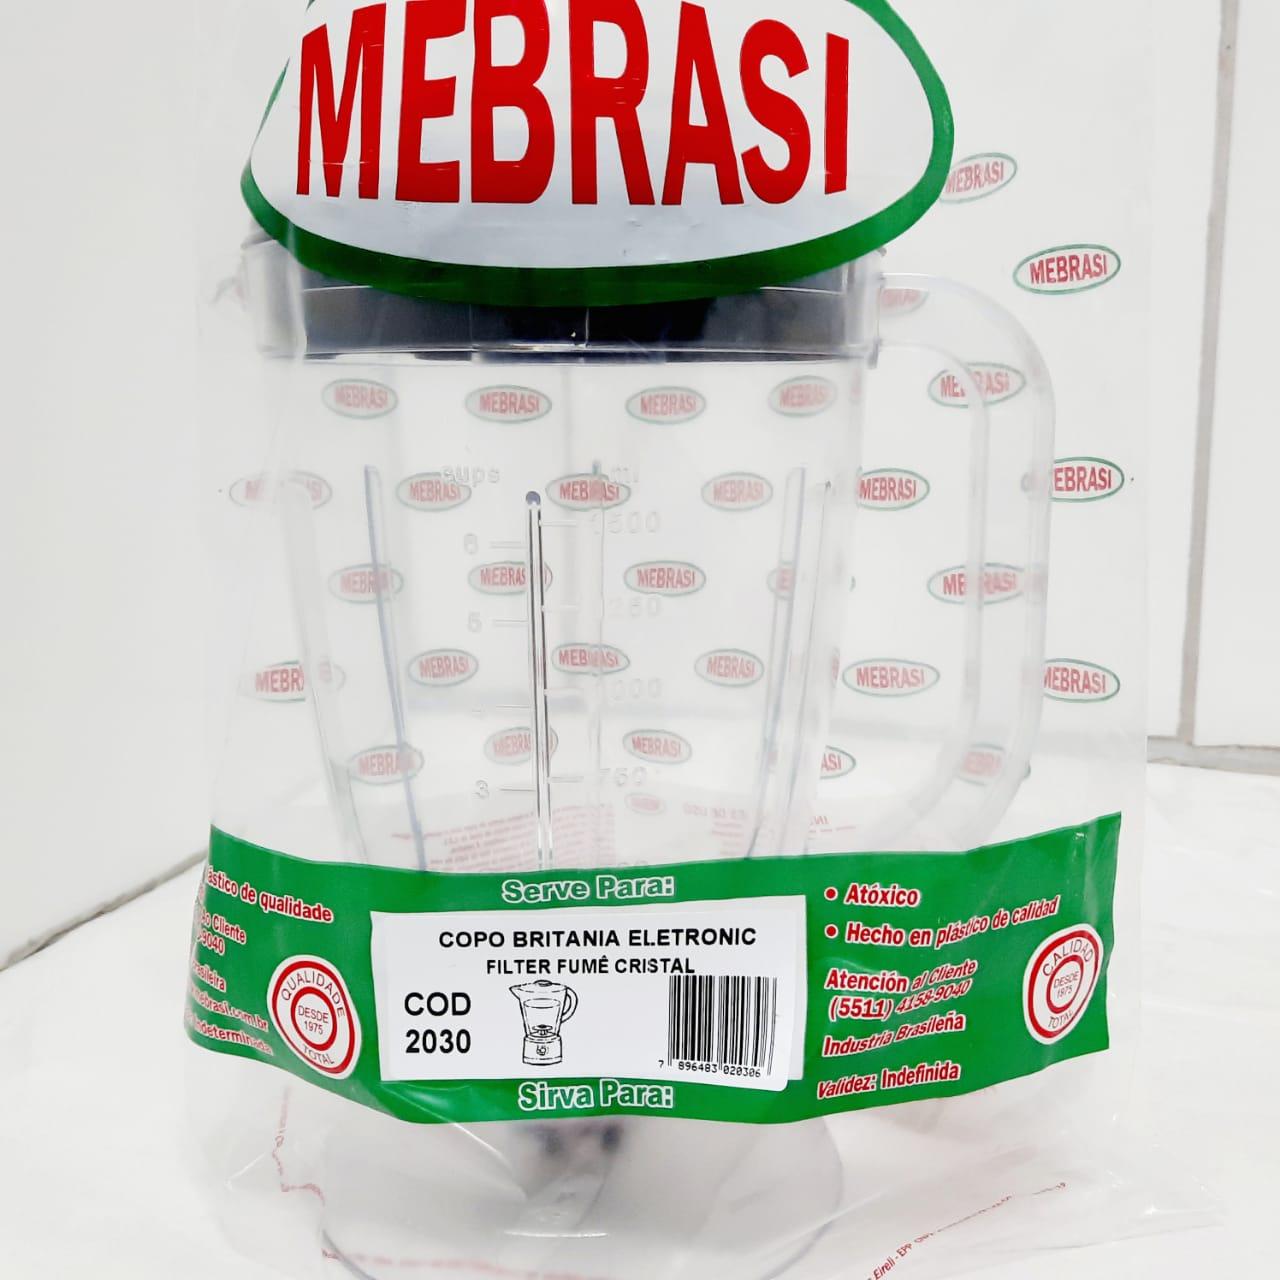 Copo Britânia Cristal FUM ELET/FILT - Mebrasi